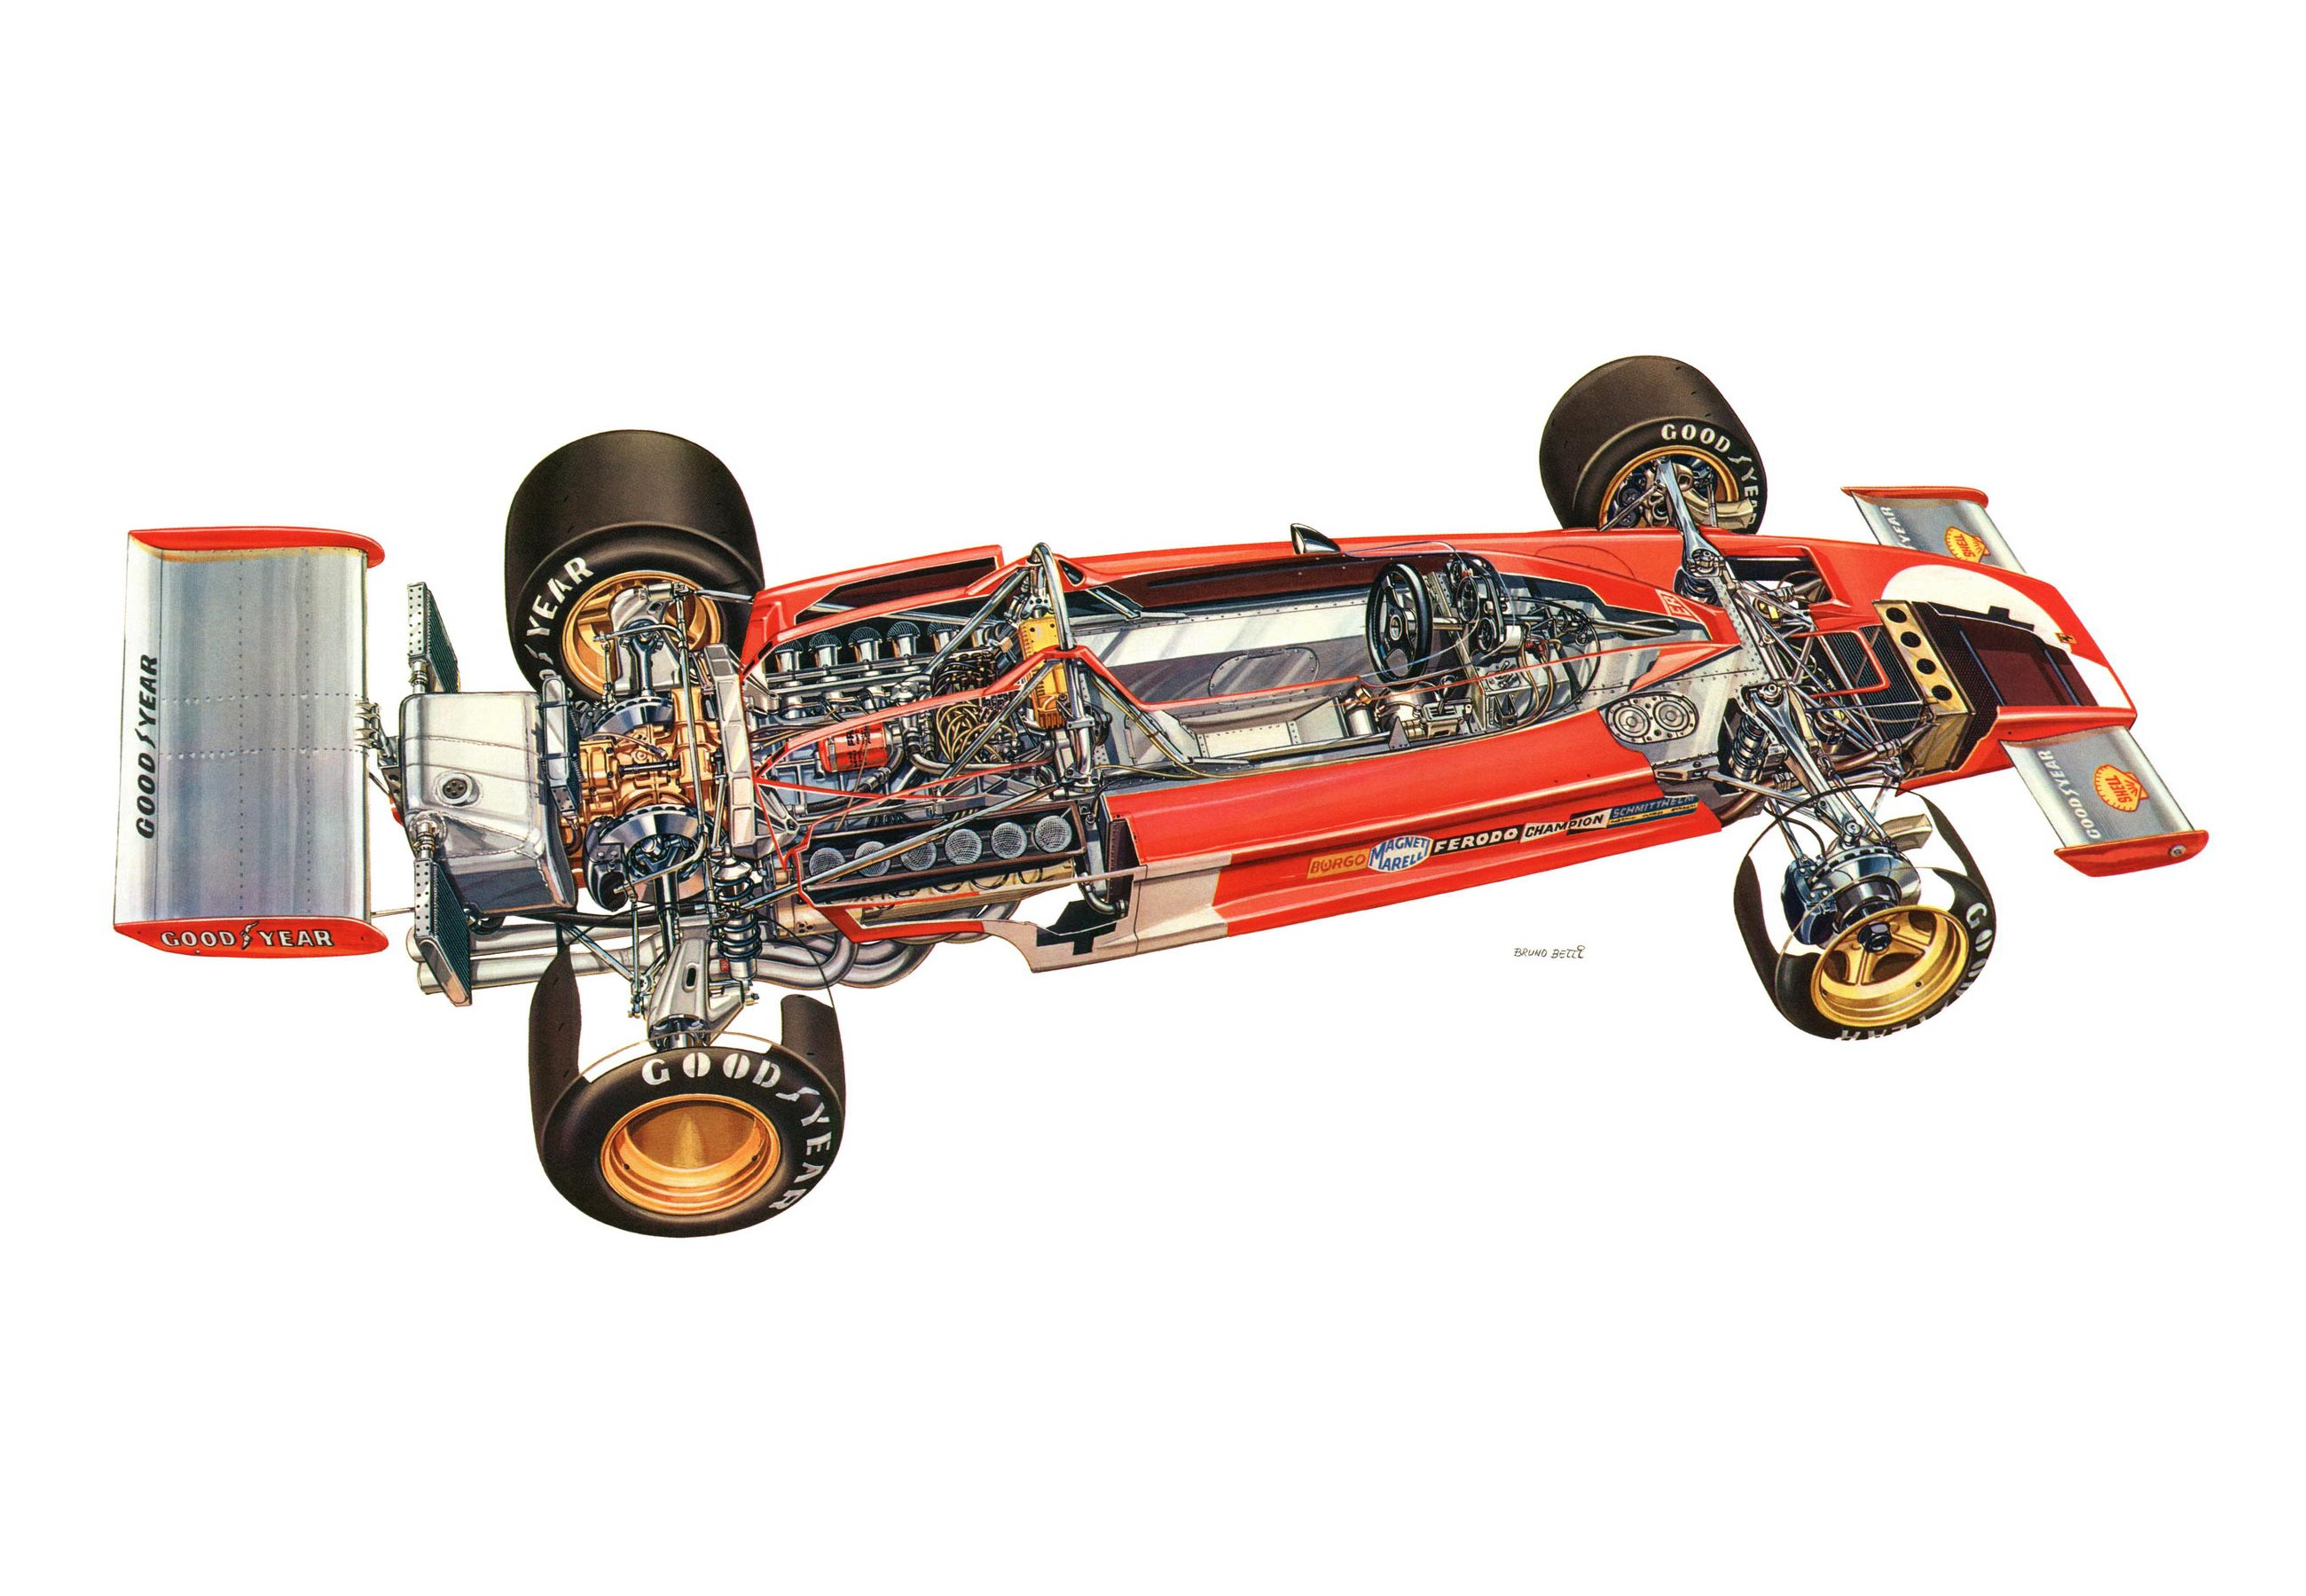 Ferrari 312 B3-73 cutaway drawing